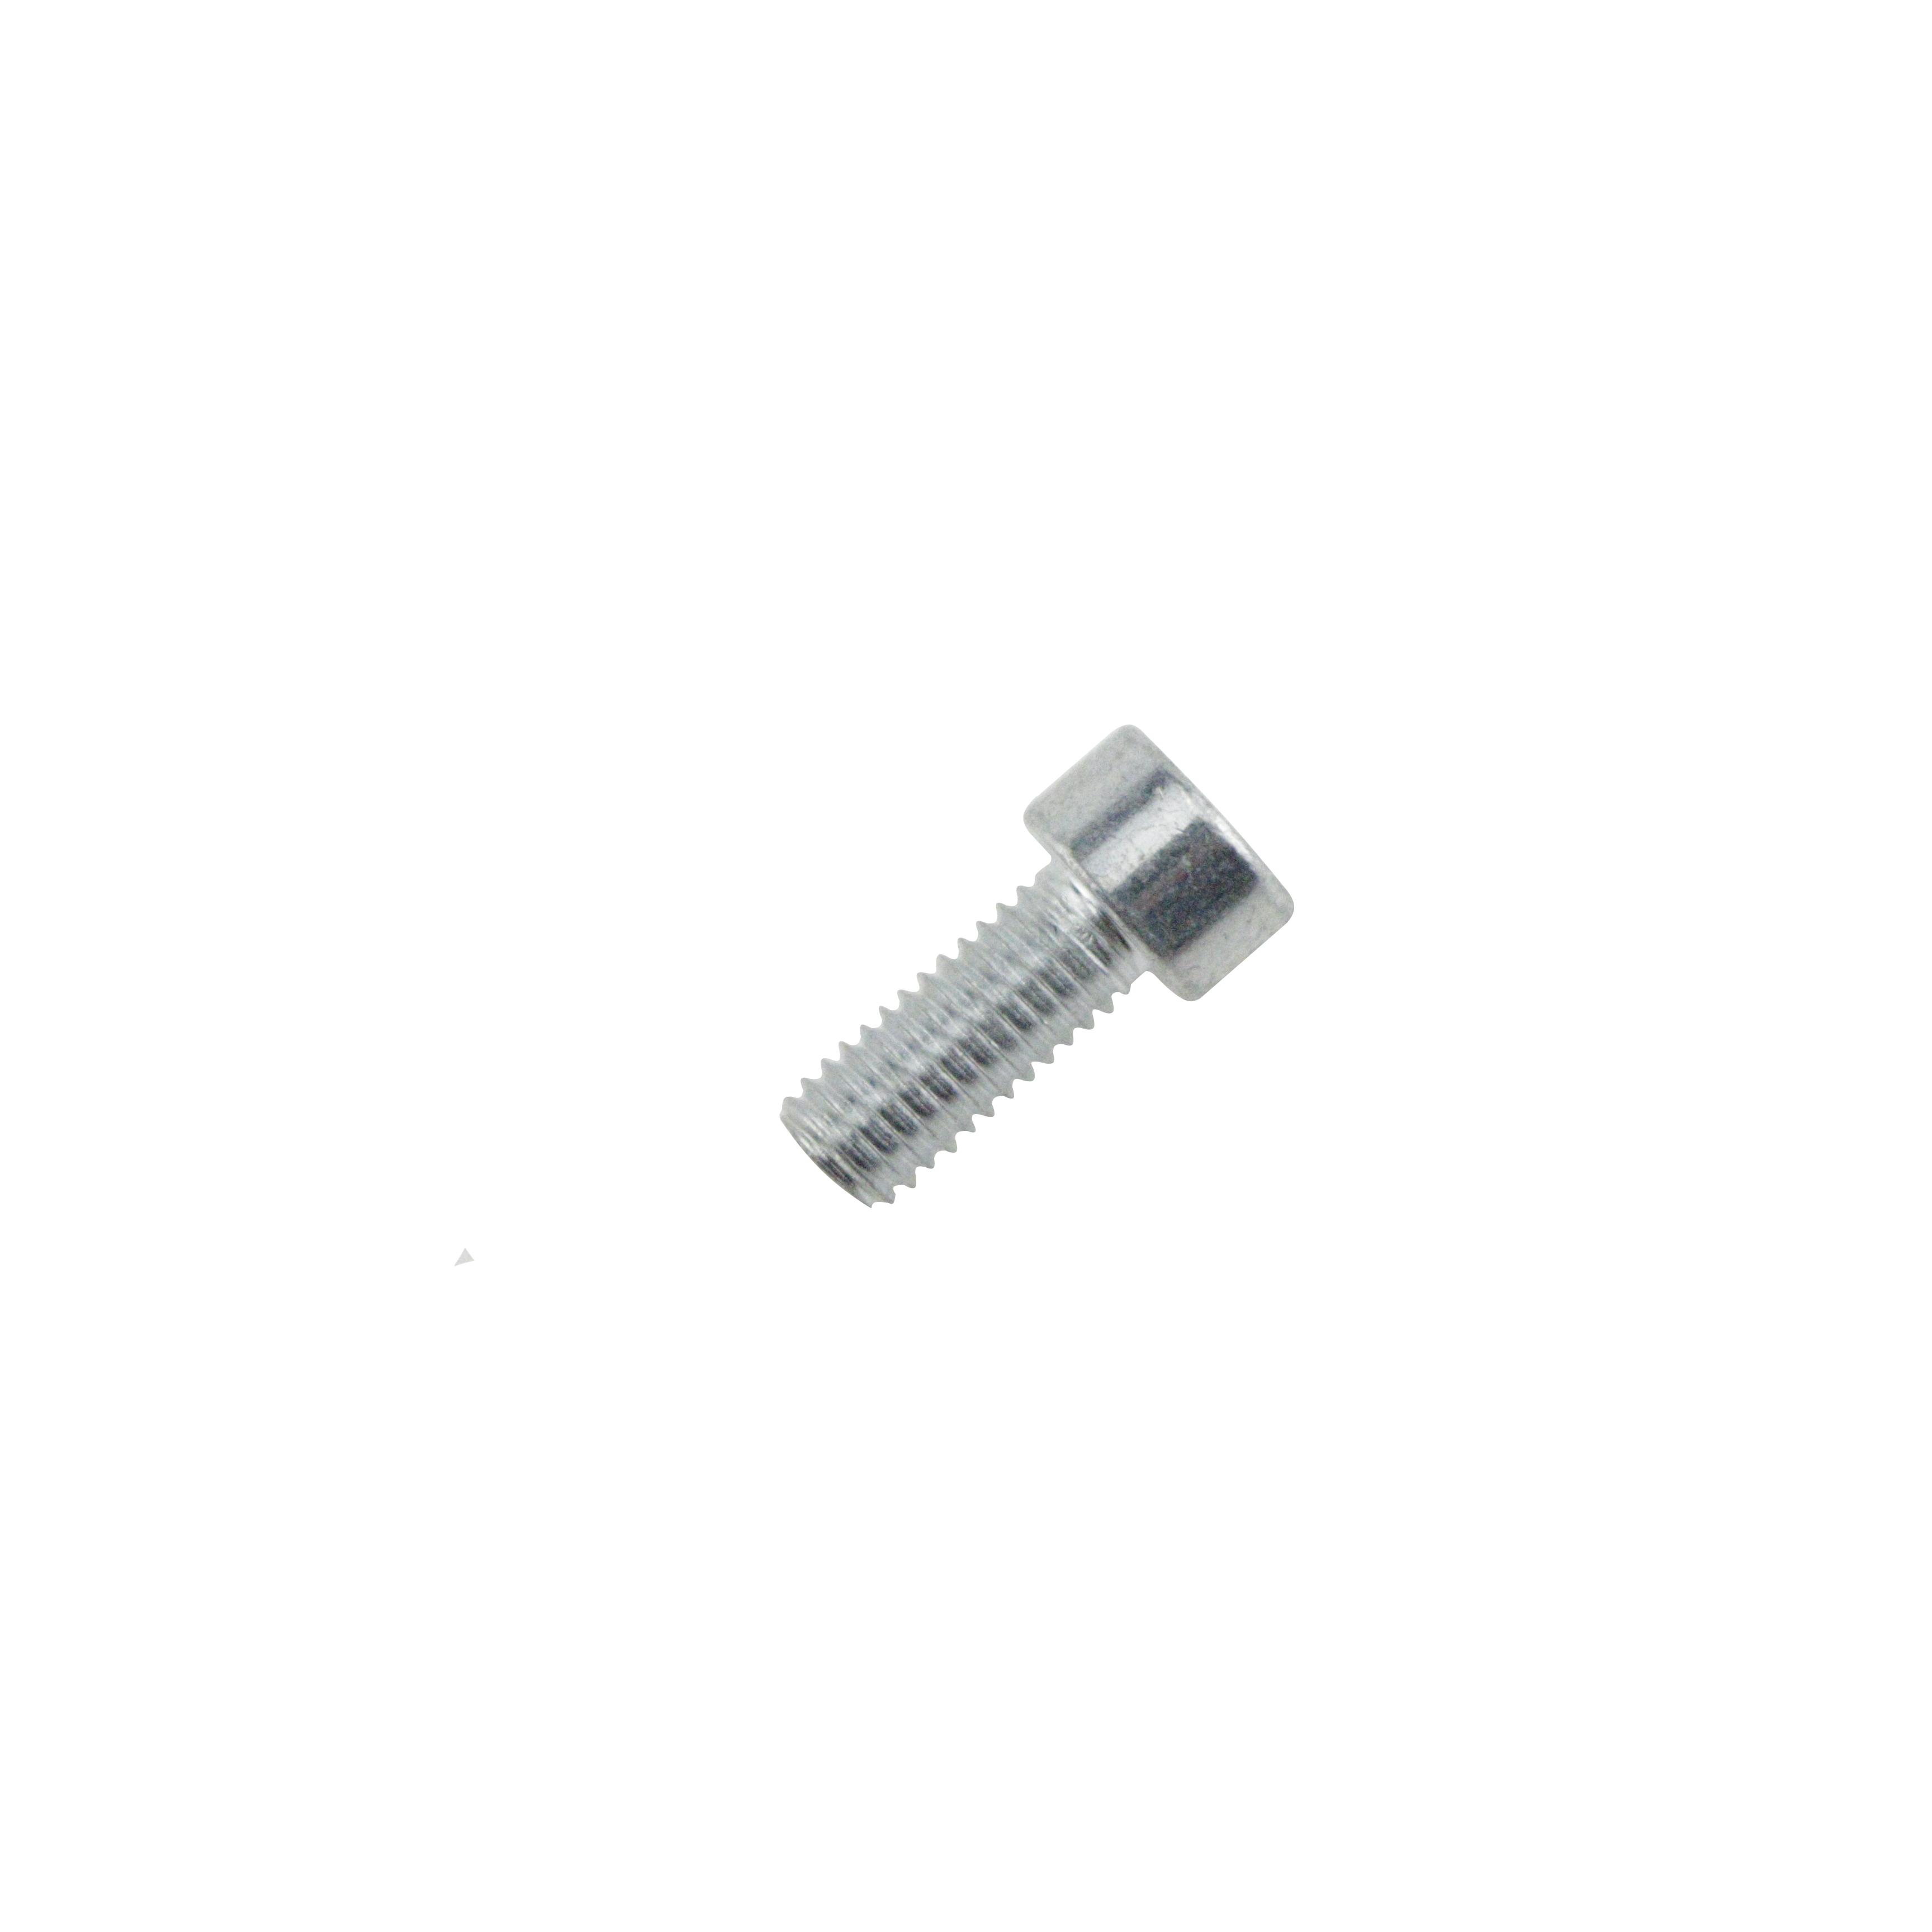 Bar Stud Collar Screw For Stihl MS200 MS200T 020T 020 Chainsaw 1129 664 2400